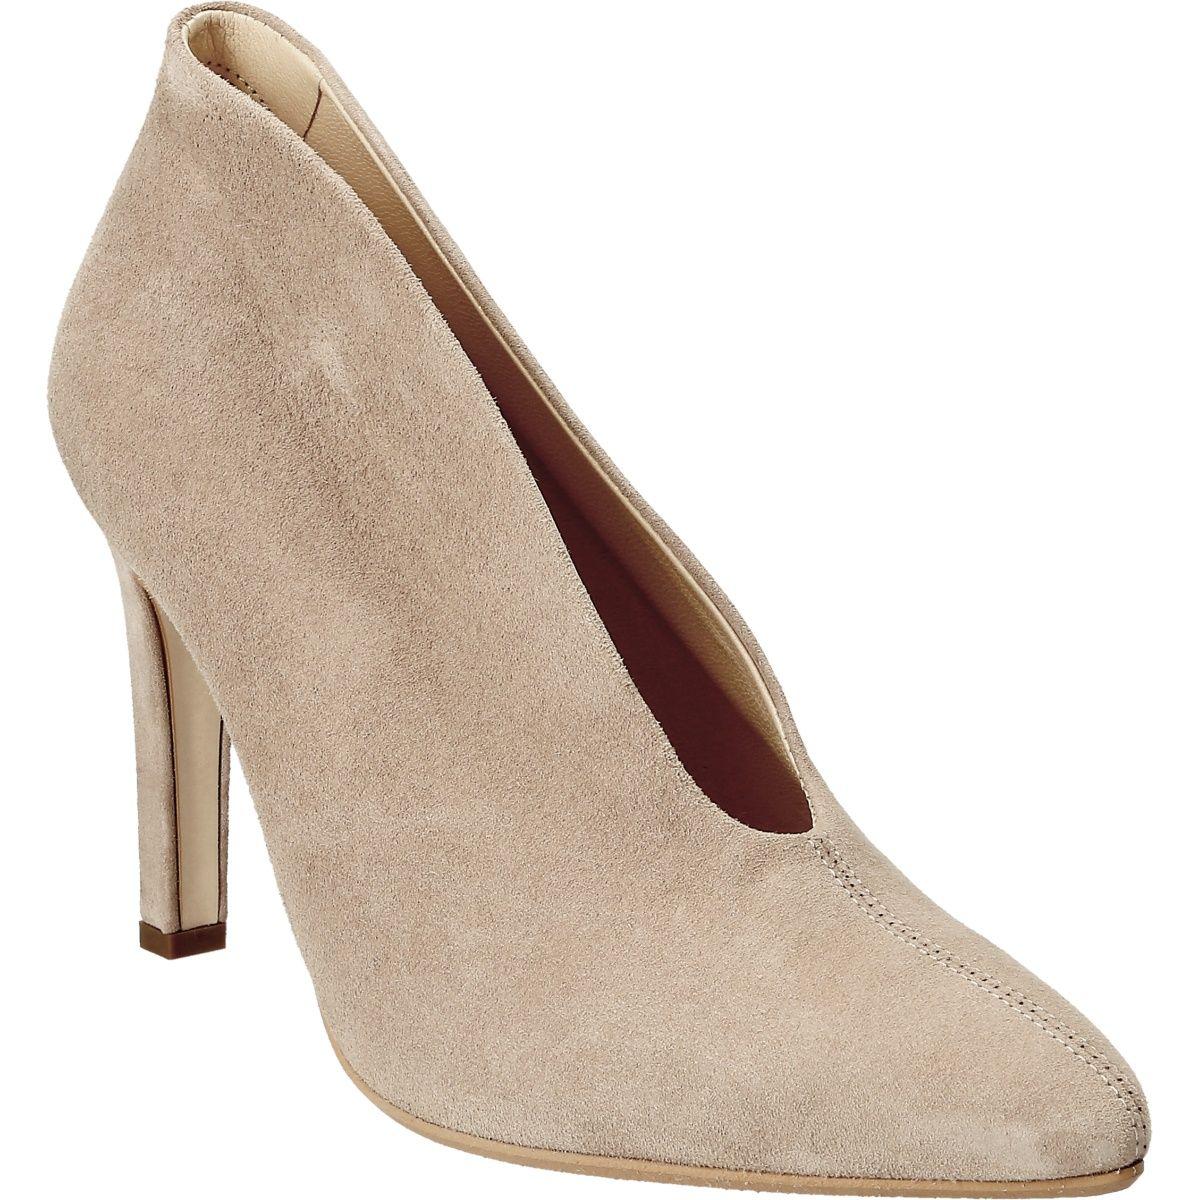 837b0ca270a5ab Paul Green 9437-044 Women s shoes Pumps buy shoes at our Schuhe Lüke ...